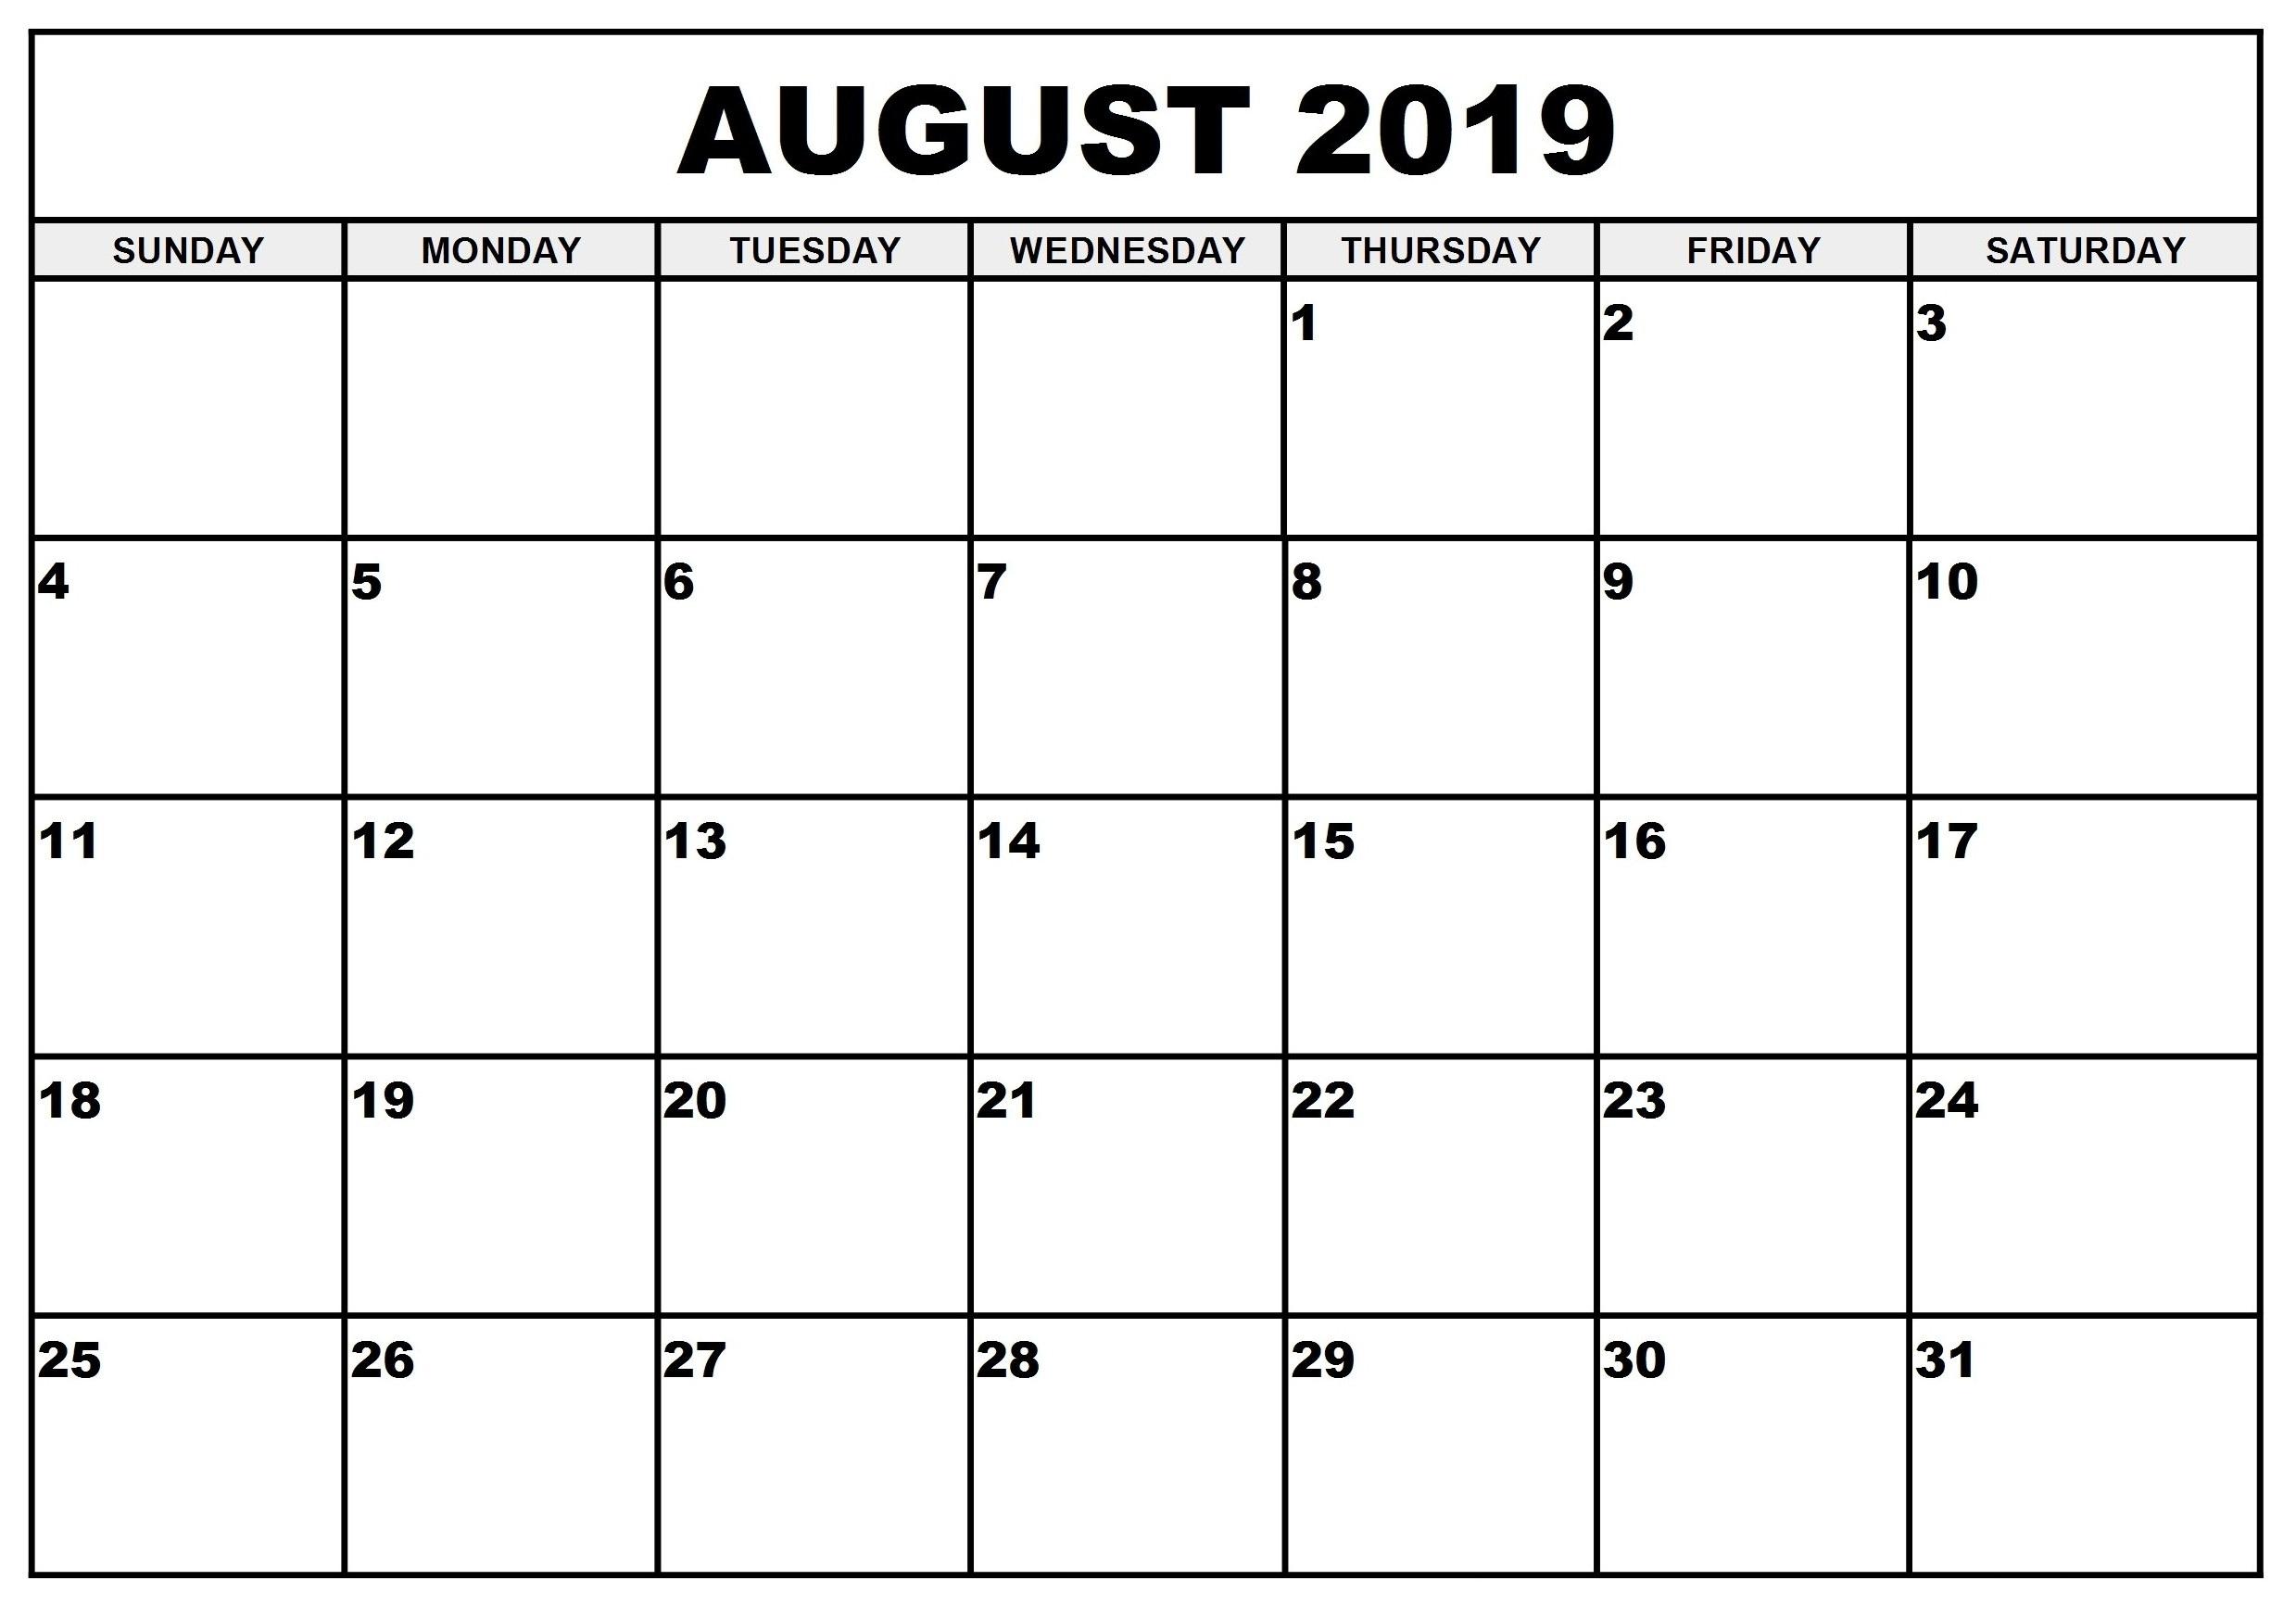 August 2019 Printable Calendar | Free Printable Calendar Shop throughout August Blank Calendar Monday Through Friday